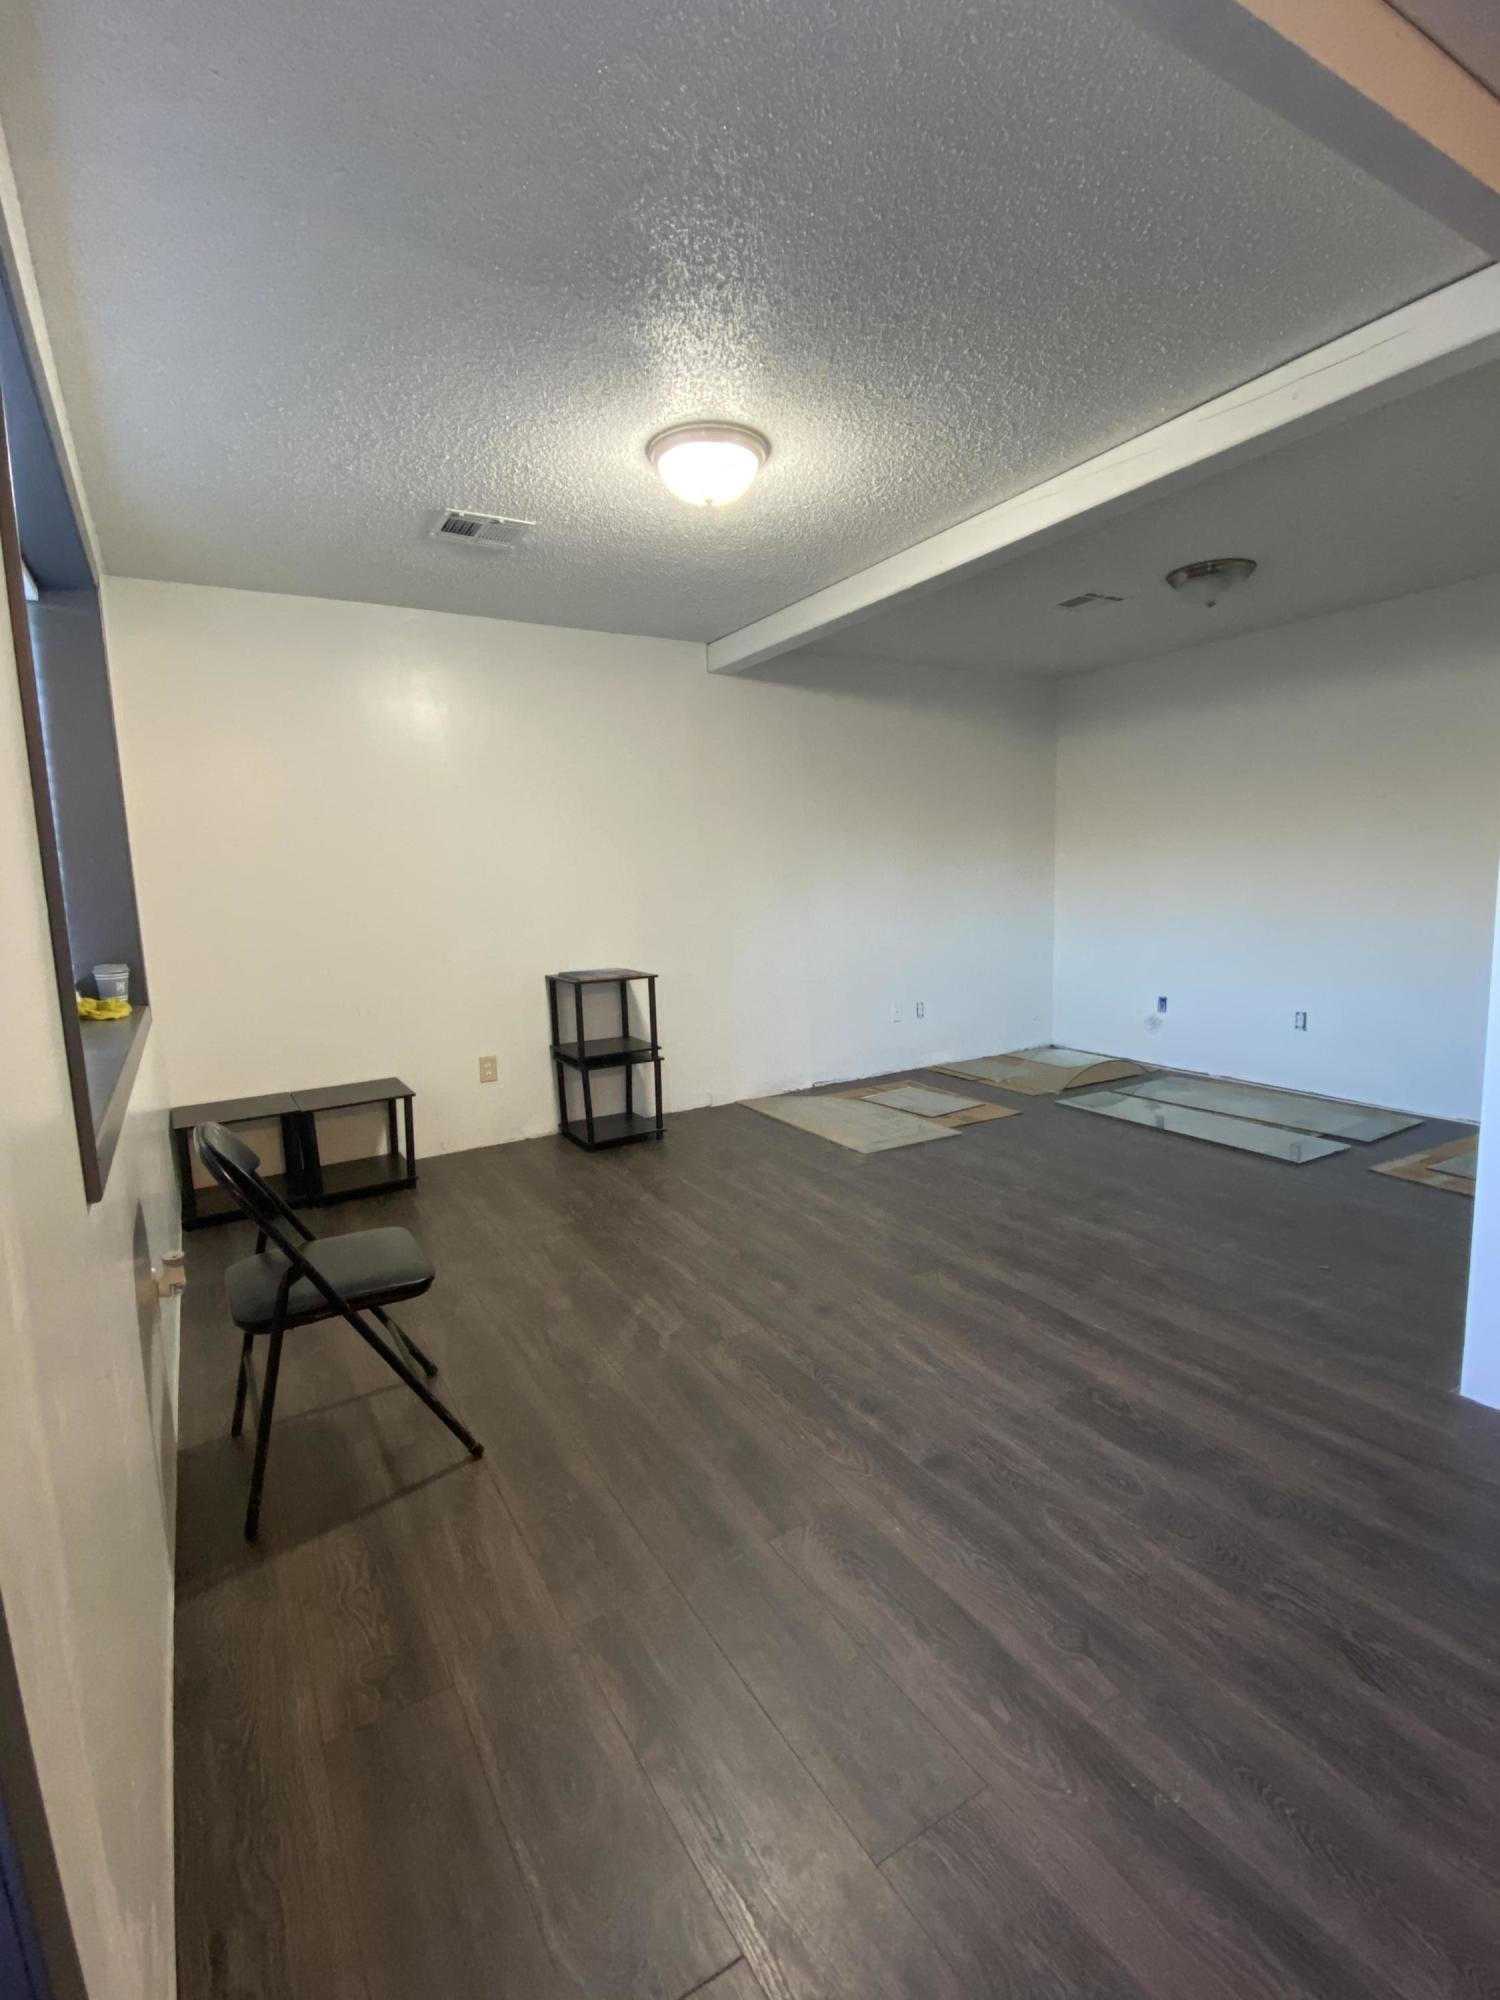 Leesville commercial property for sale, 16930 Lake Charles Hwy, Leesville LA - $149,900